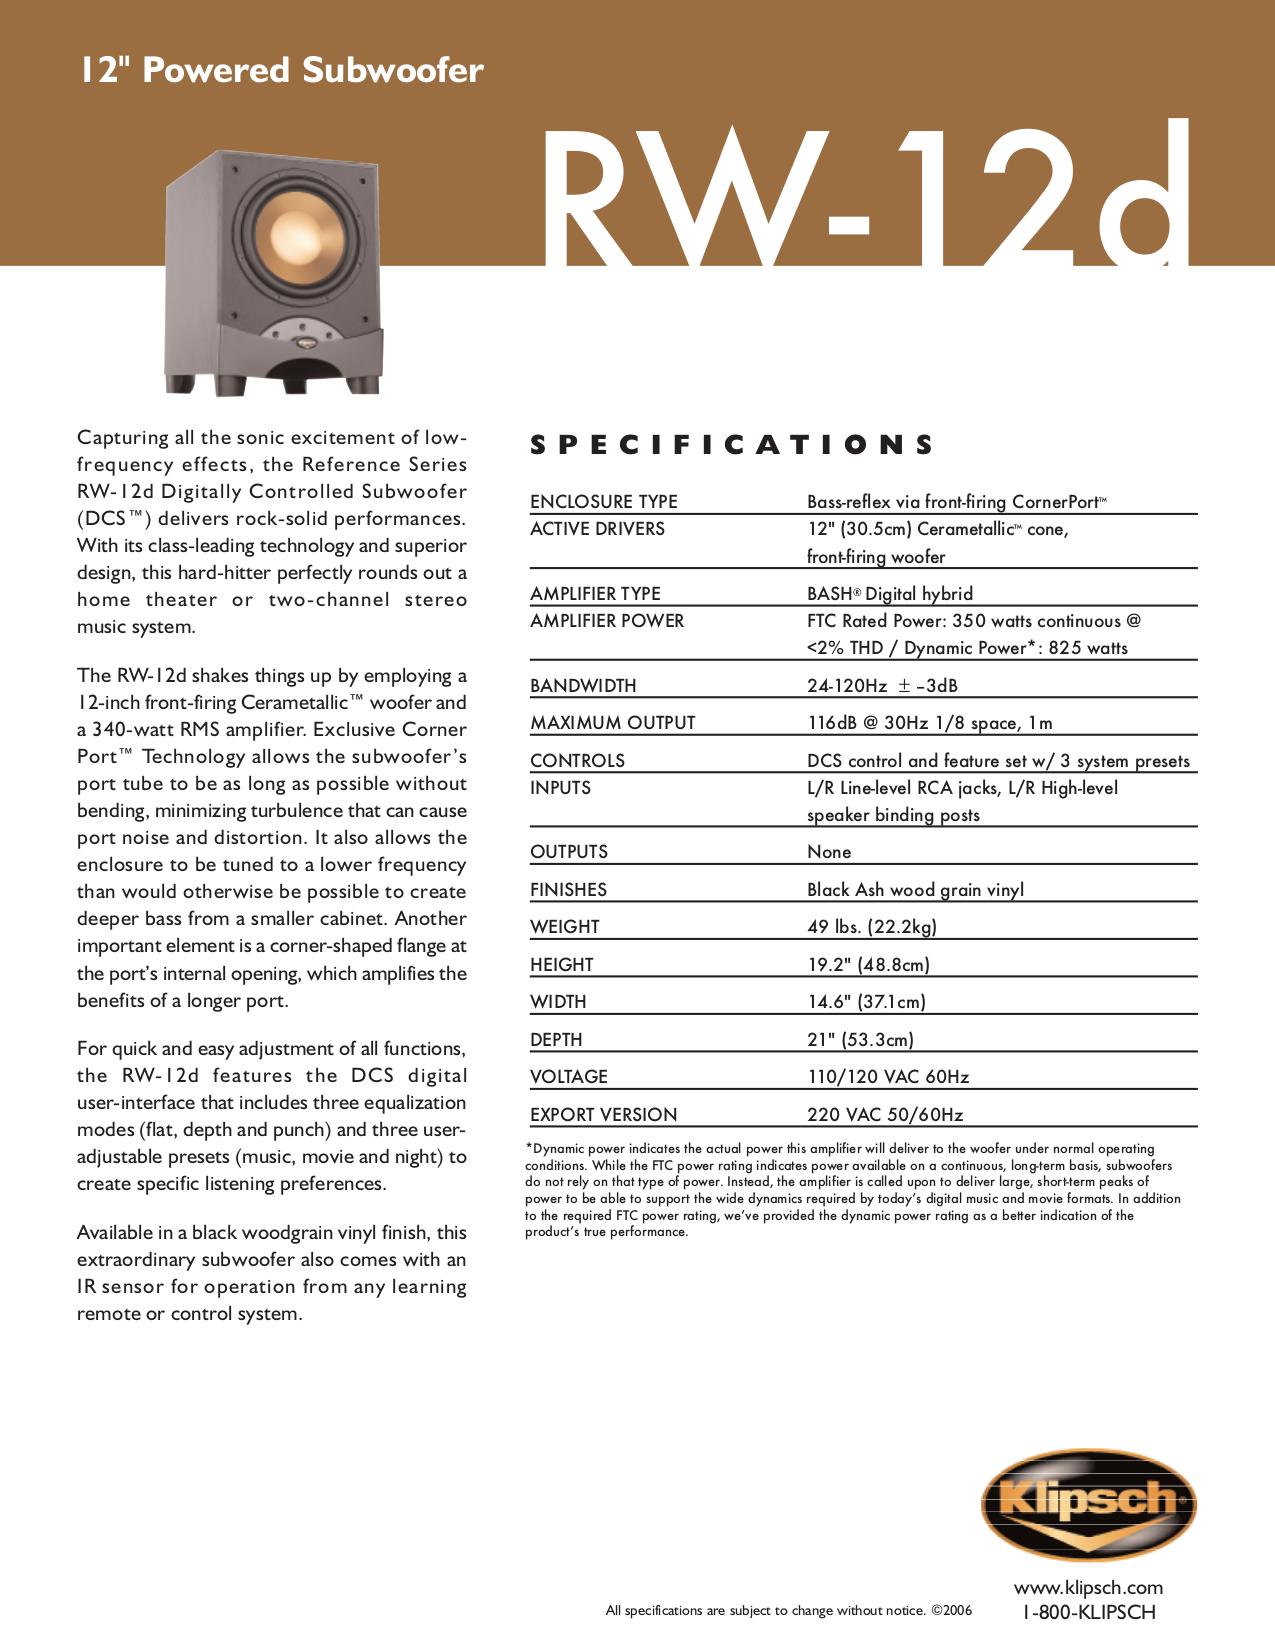 klipsch rw 12d manual